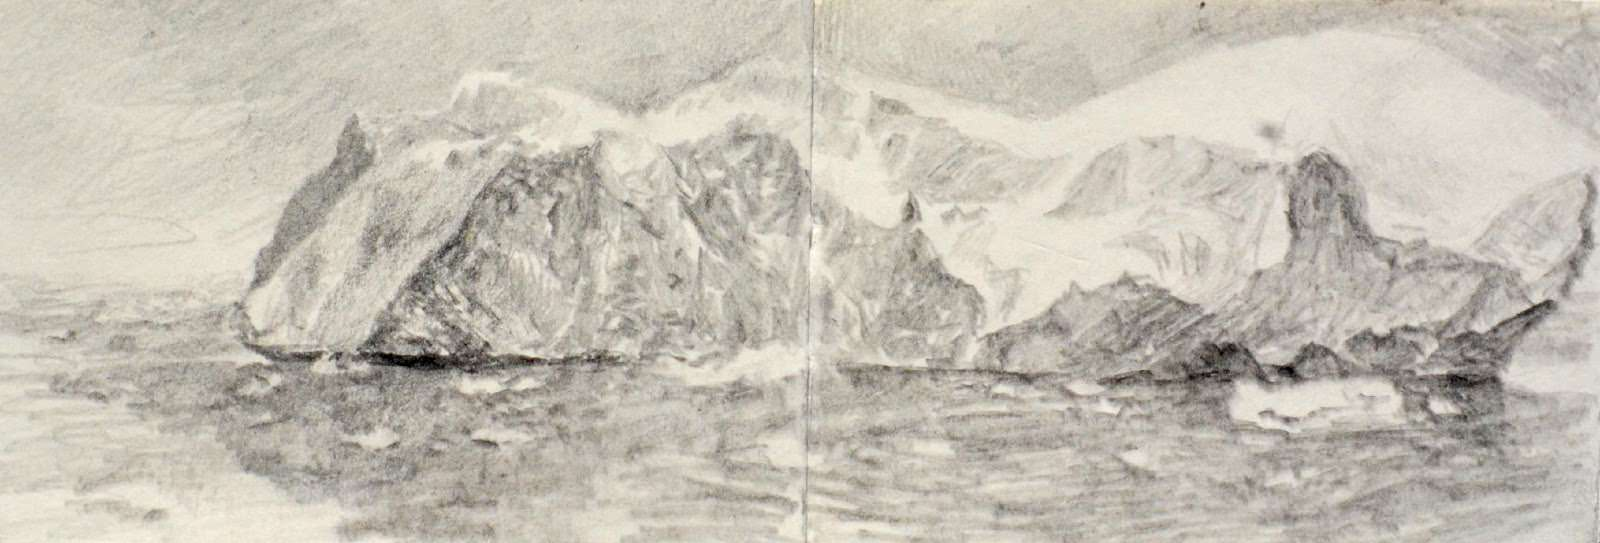 Iceberg, Weddell Sea . 9 x 24 cm, pencil on sketchbook, 2018